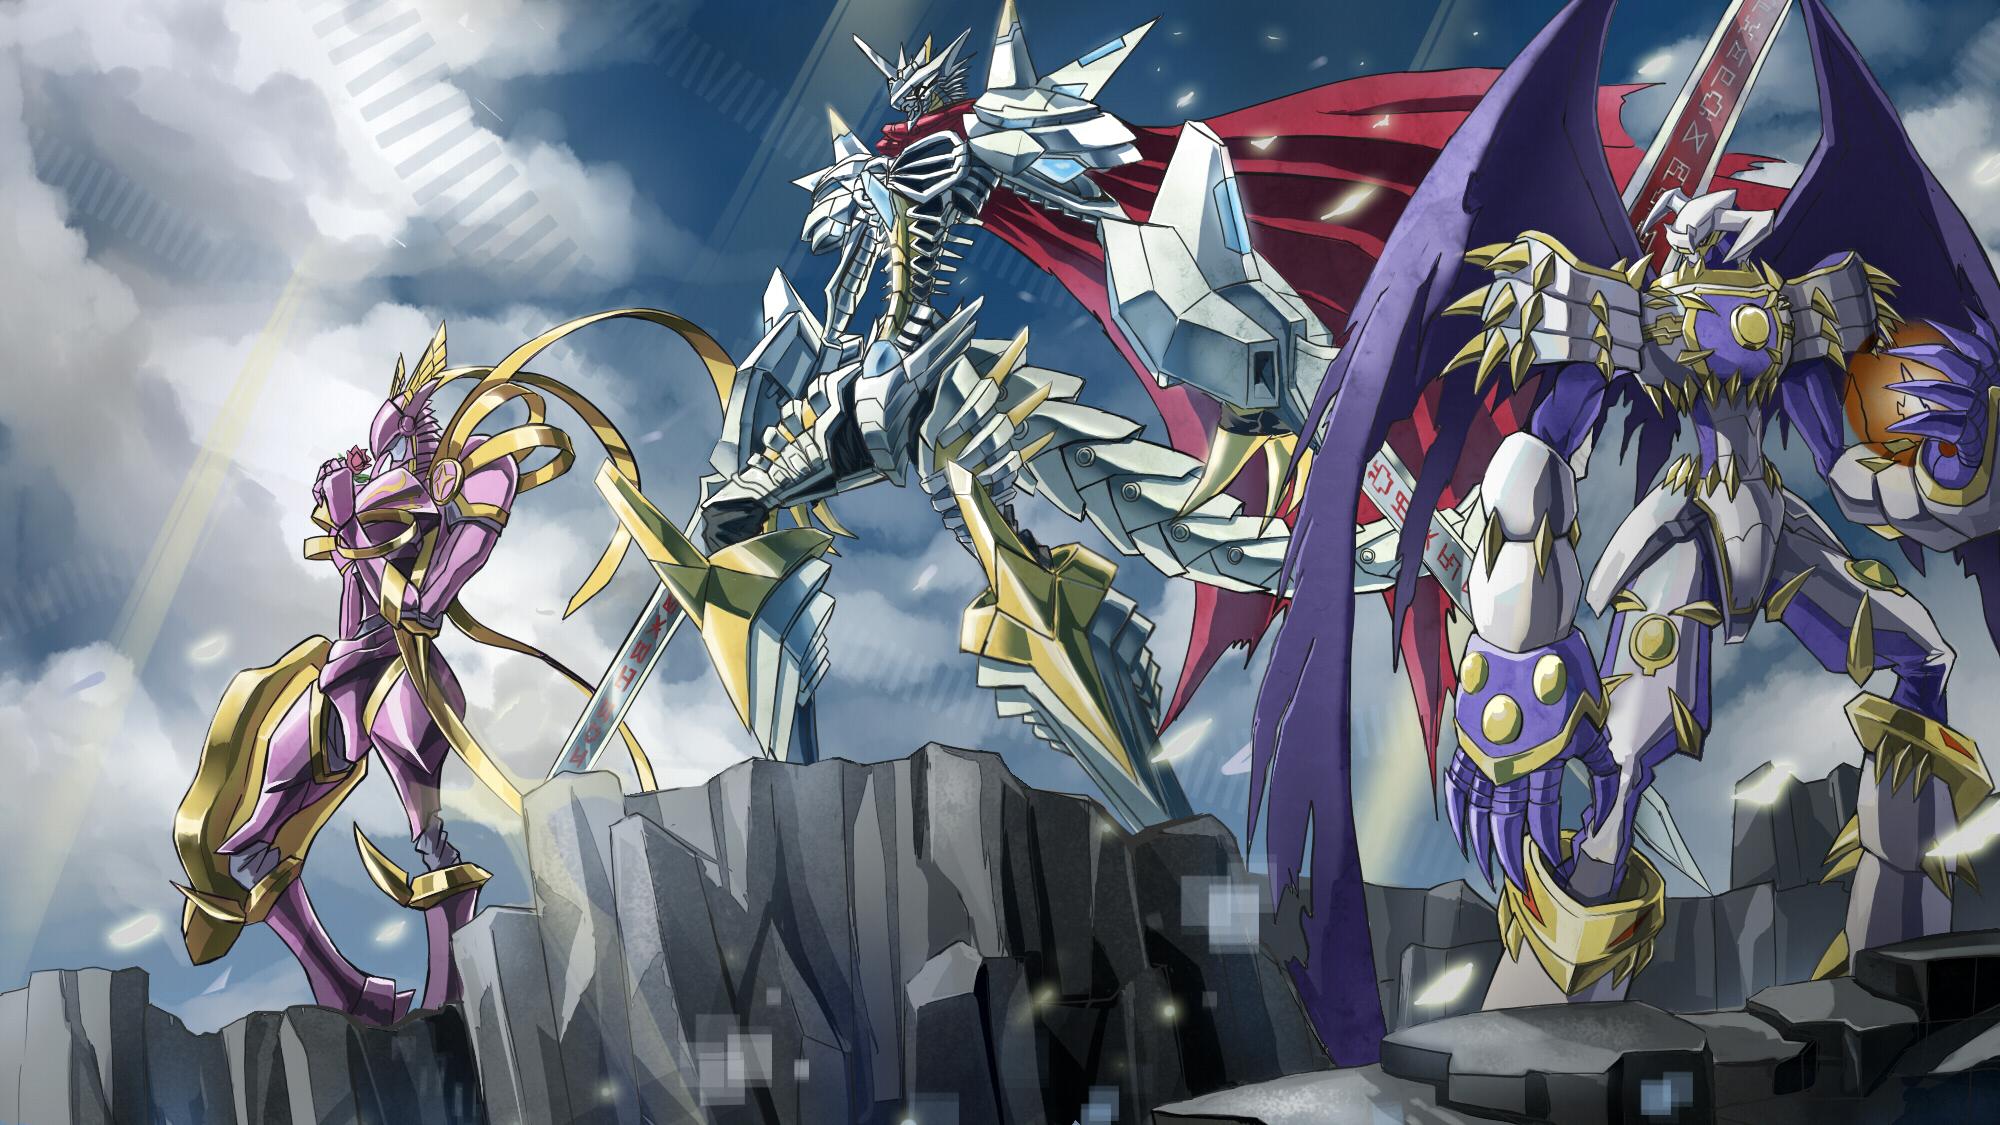 Lordknightmon Dynasmon And Jesmon Digimon Drawn By Dk 13855103534 Danbooru Limit my search to r/digimon. lordknightmon dynasmon and jesmon